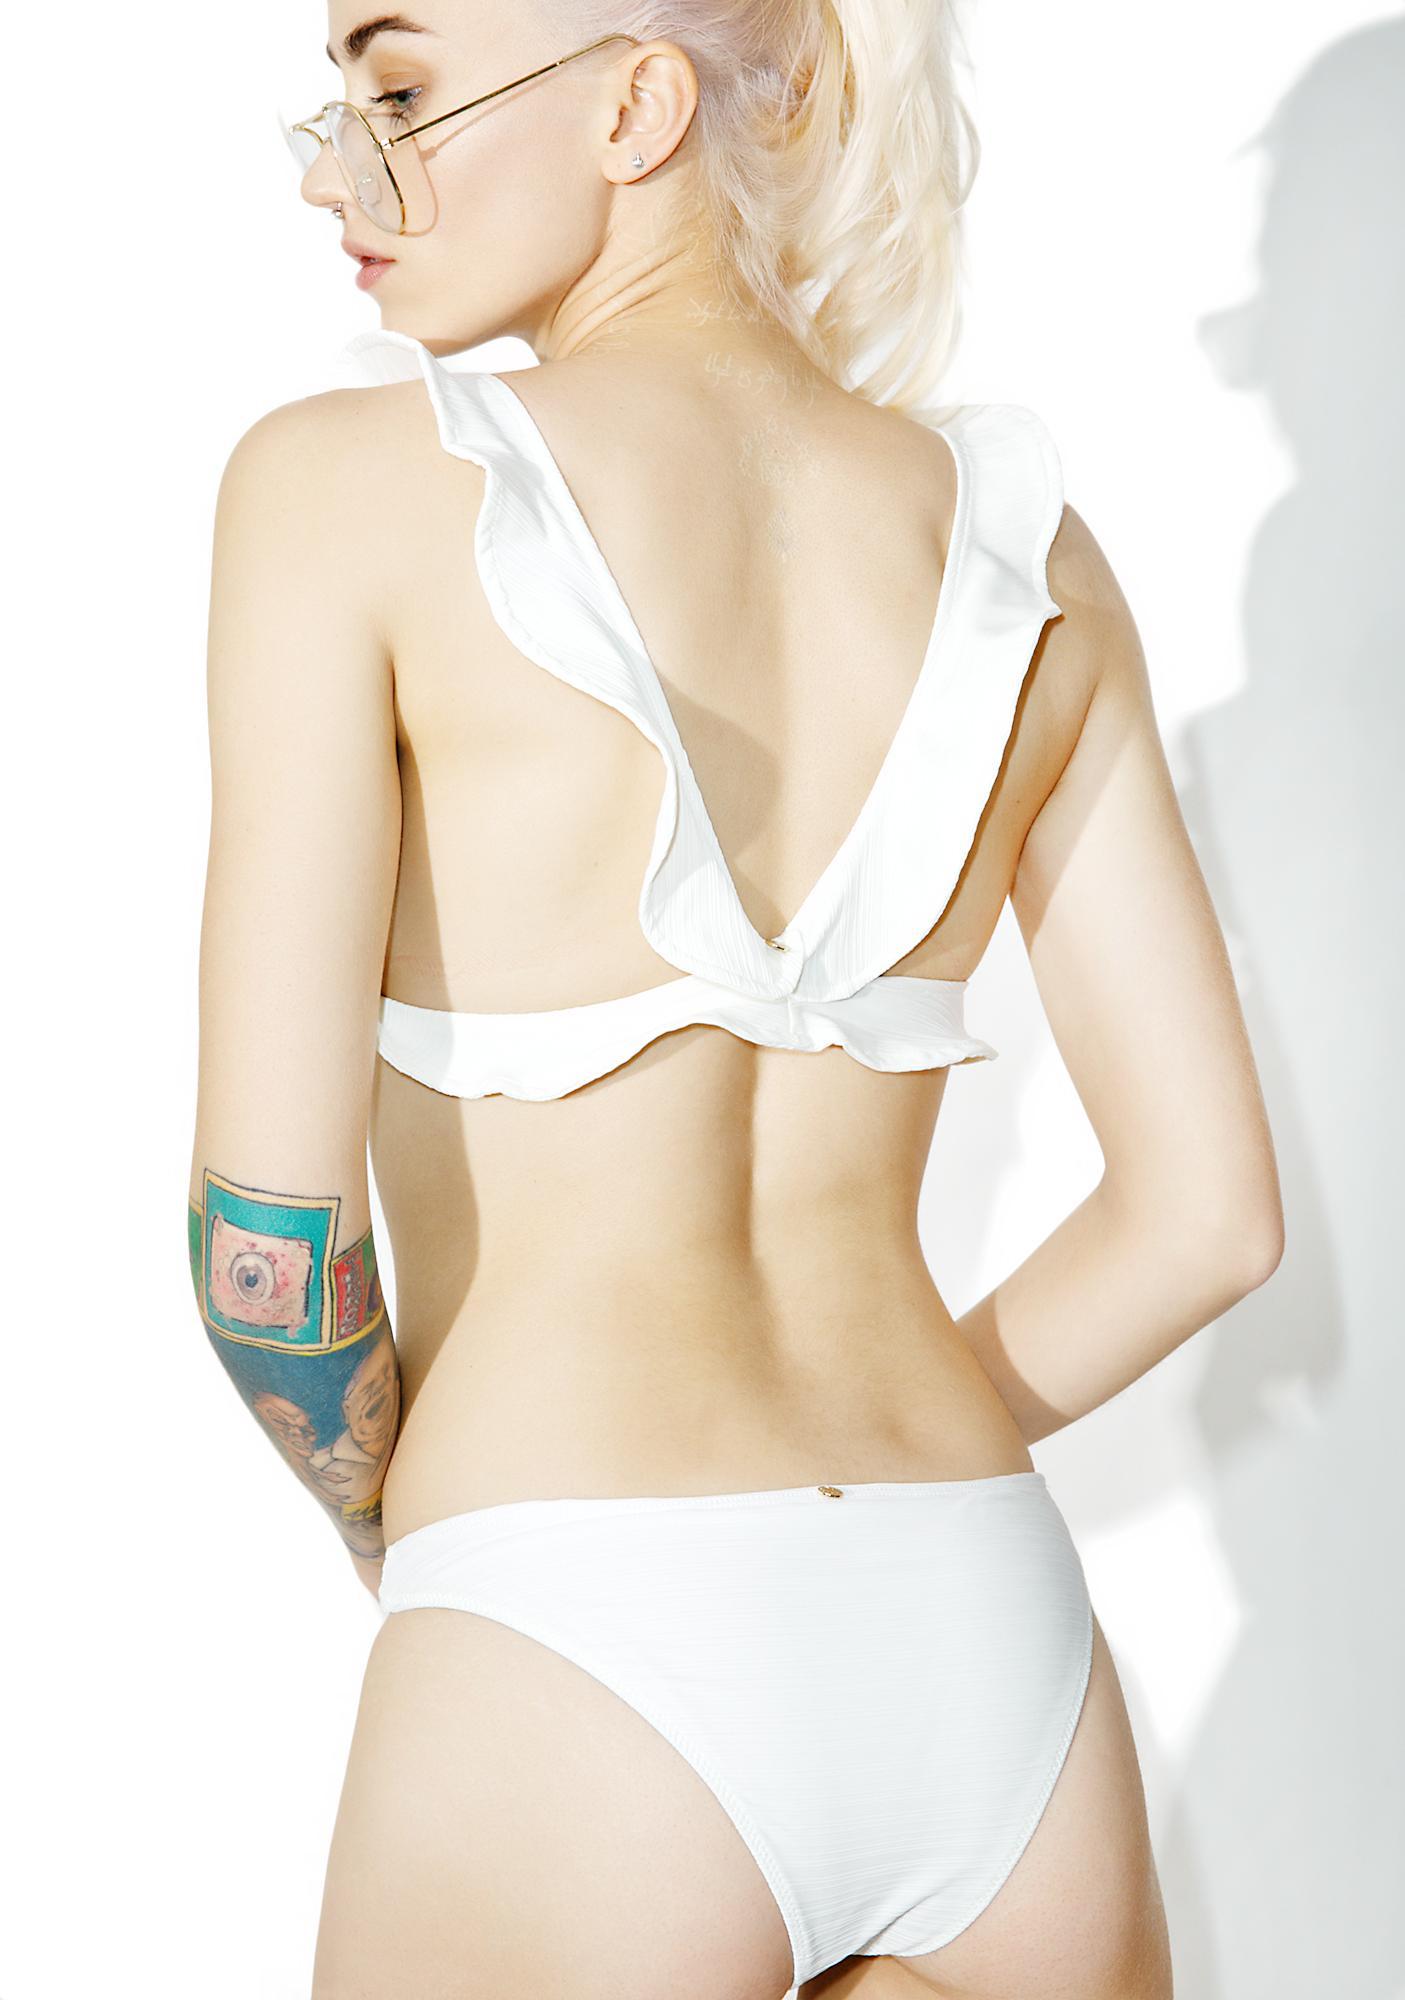 071d9ad254 ... Bikini Top · For Love   Lemons Corsica Lacey Ruffle Bikini ...